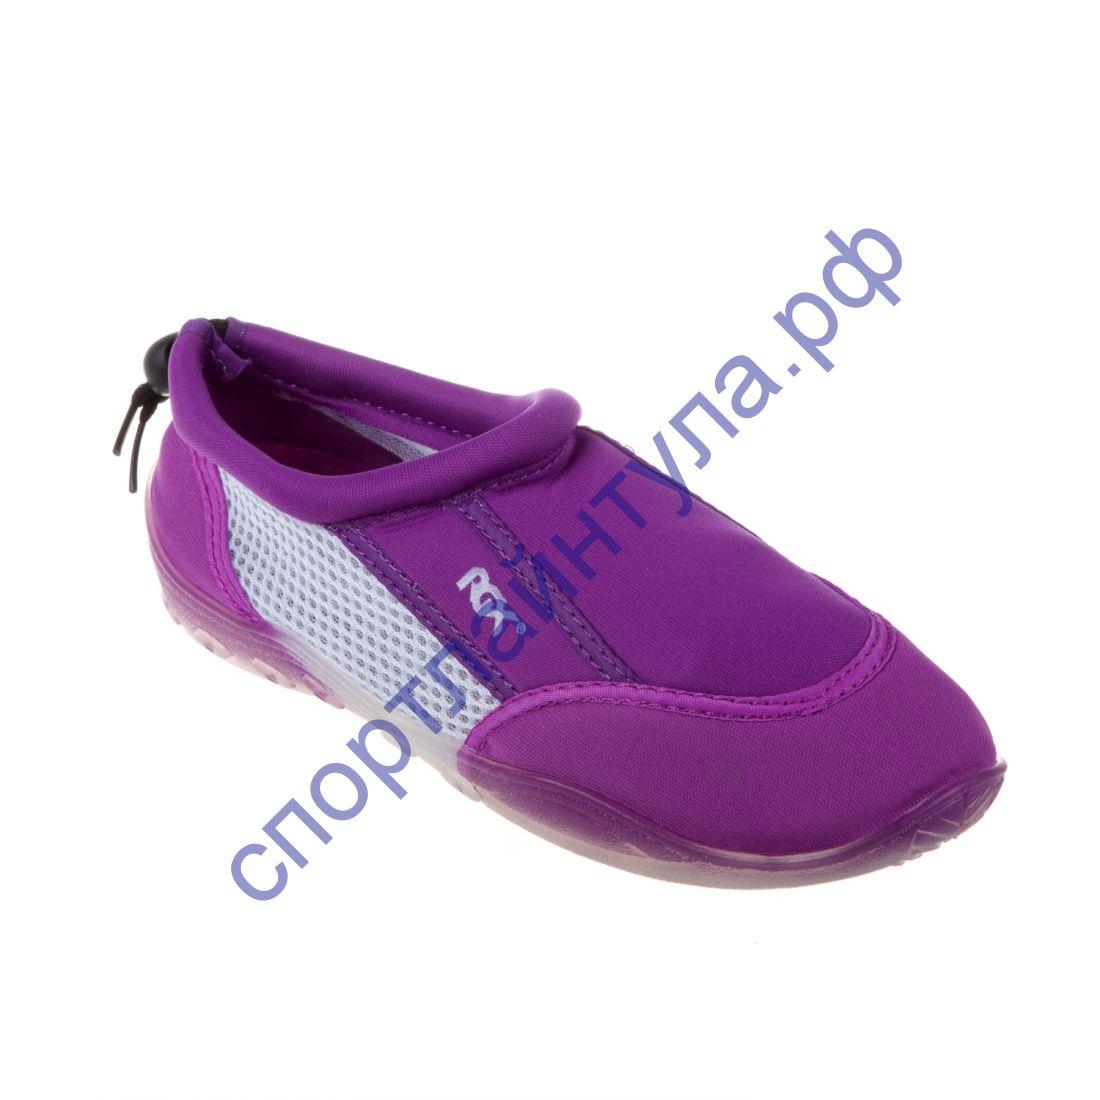 Коралловые тапочки RGX KR2 пурпурные